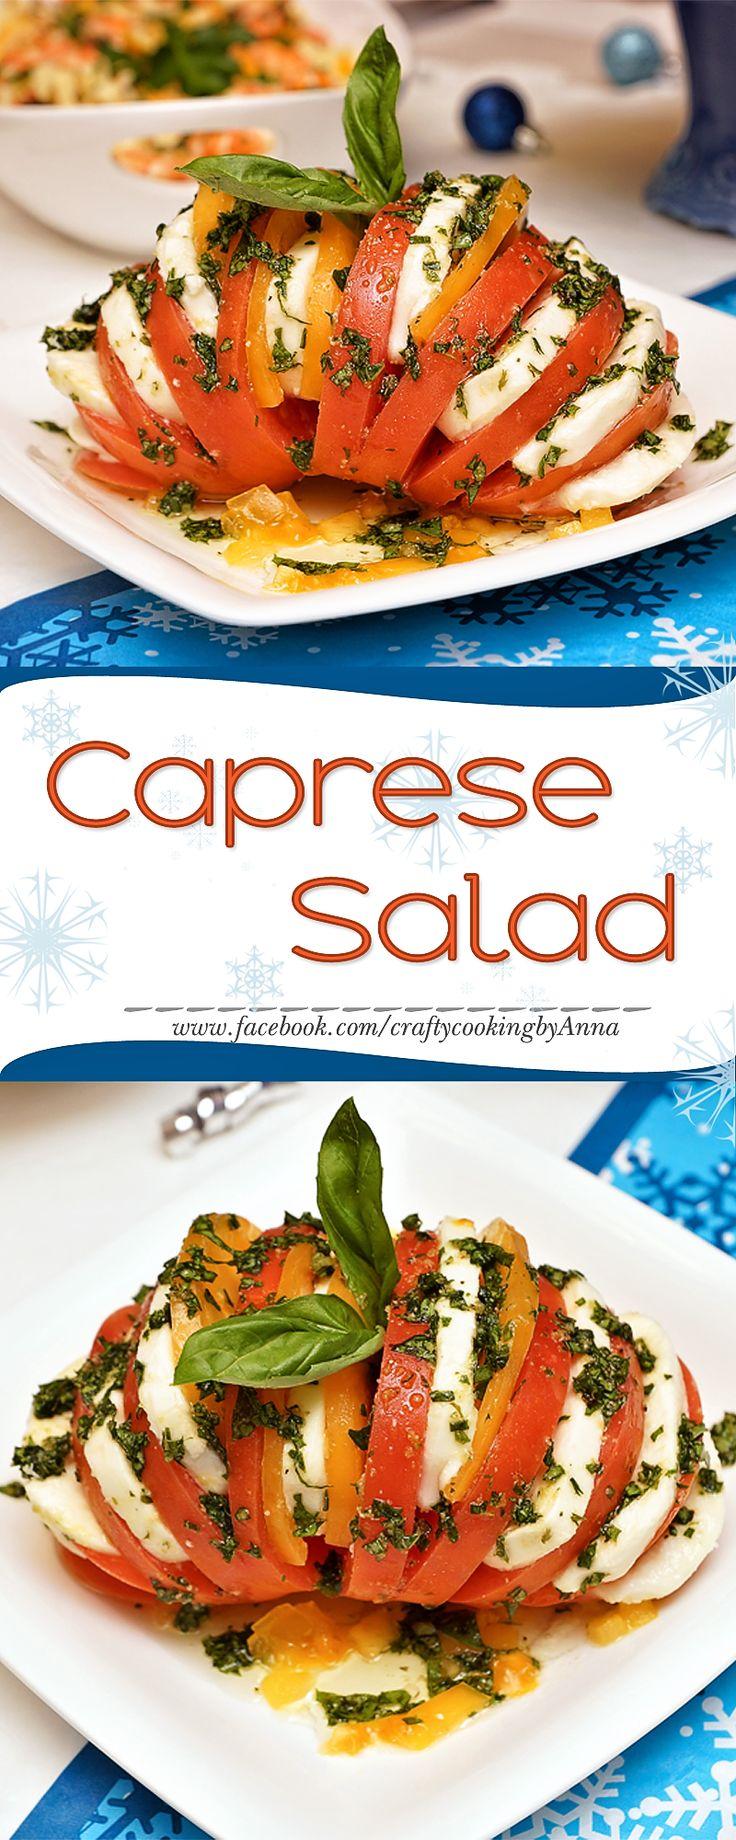 Caprese Salad! #Easy #Fancy #Holidays #Party